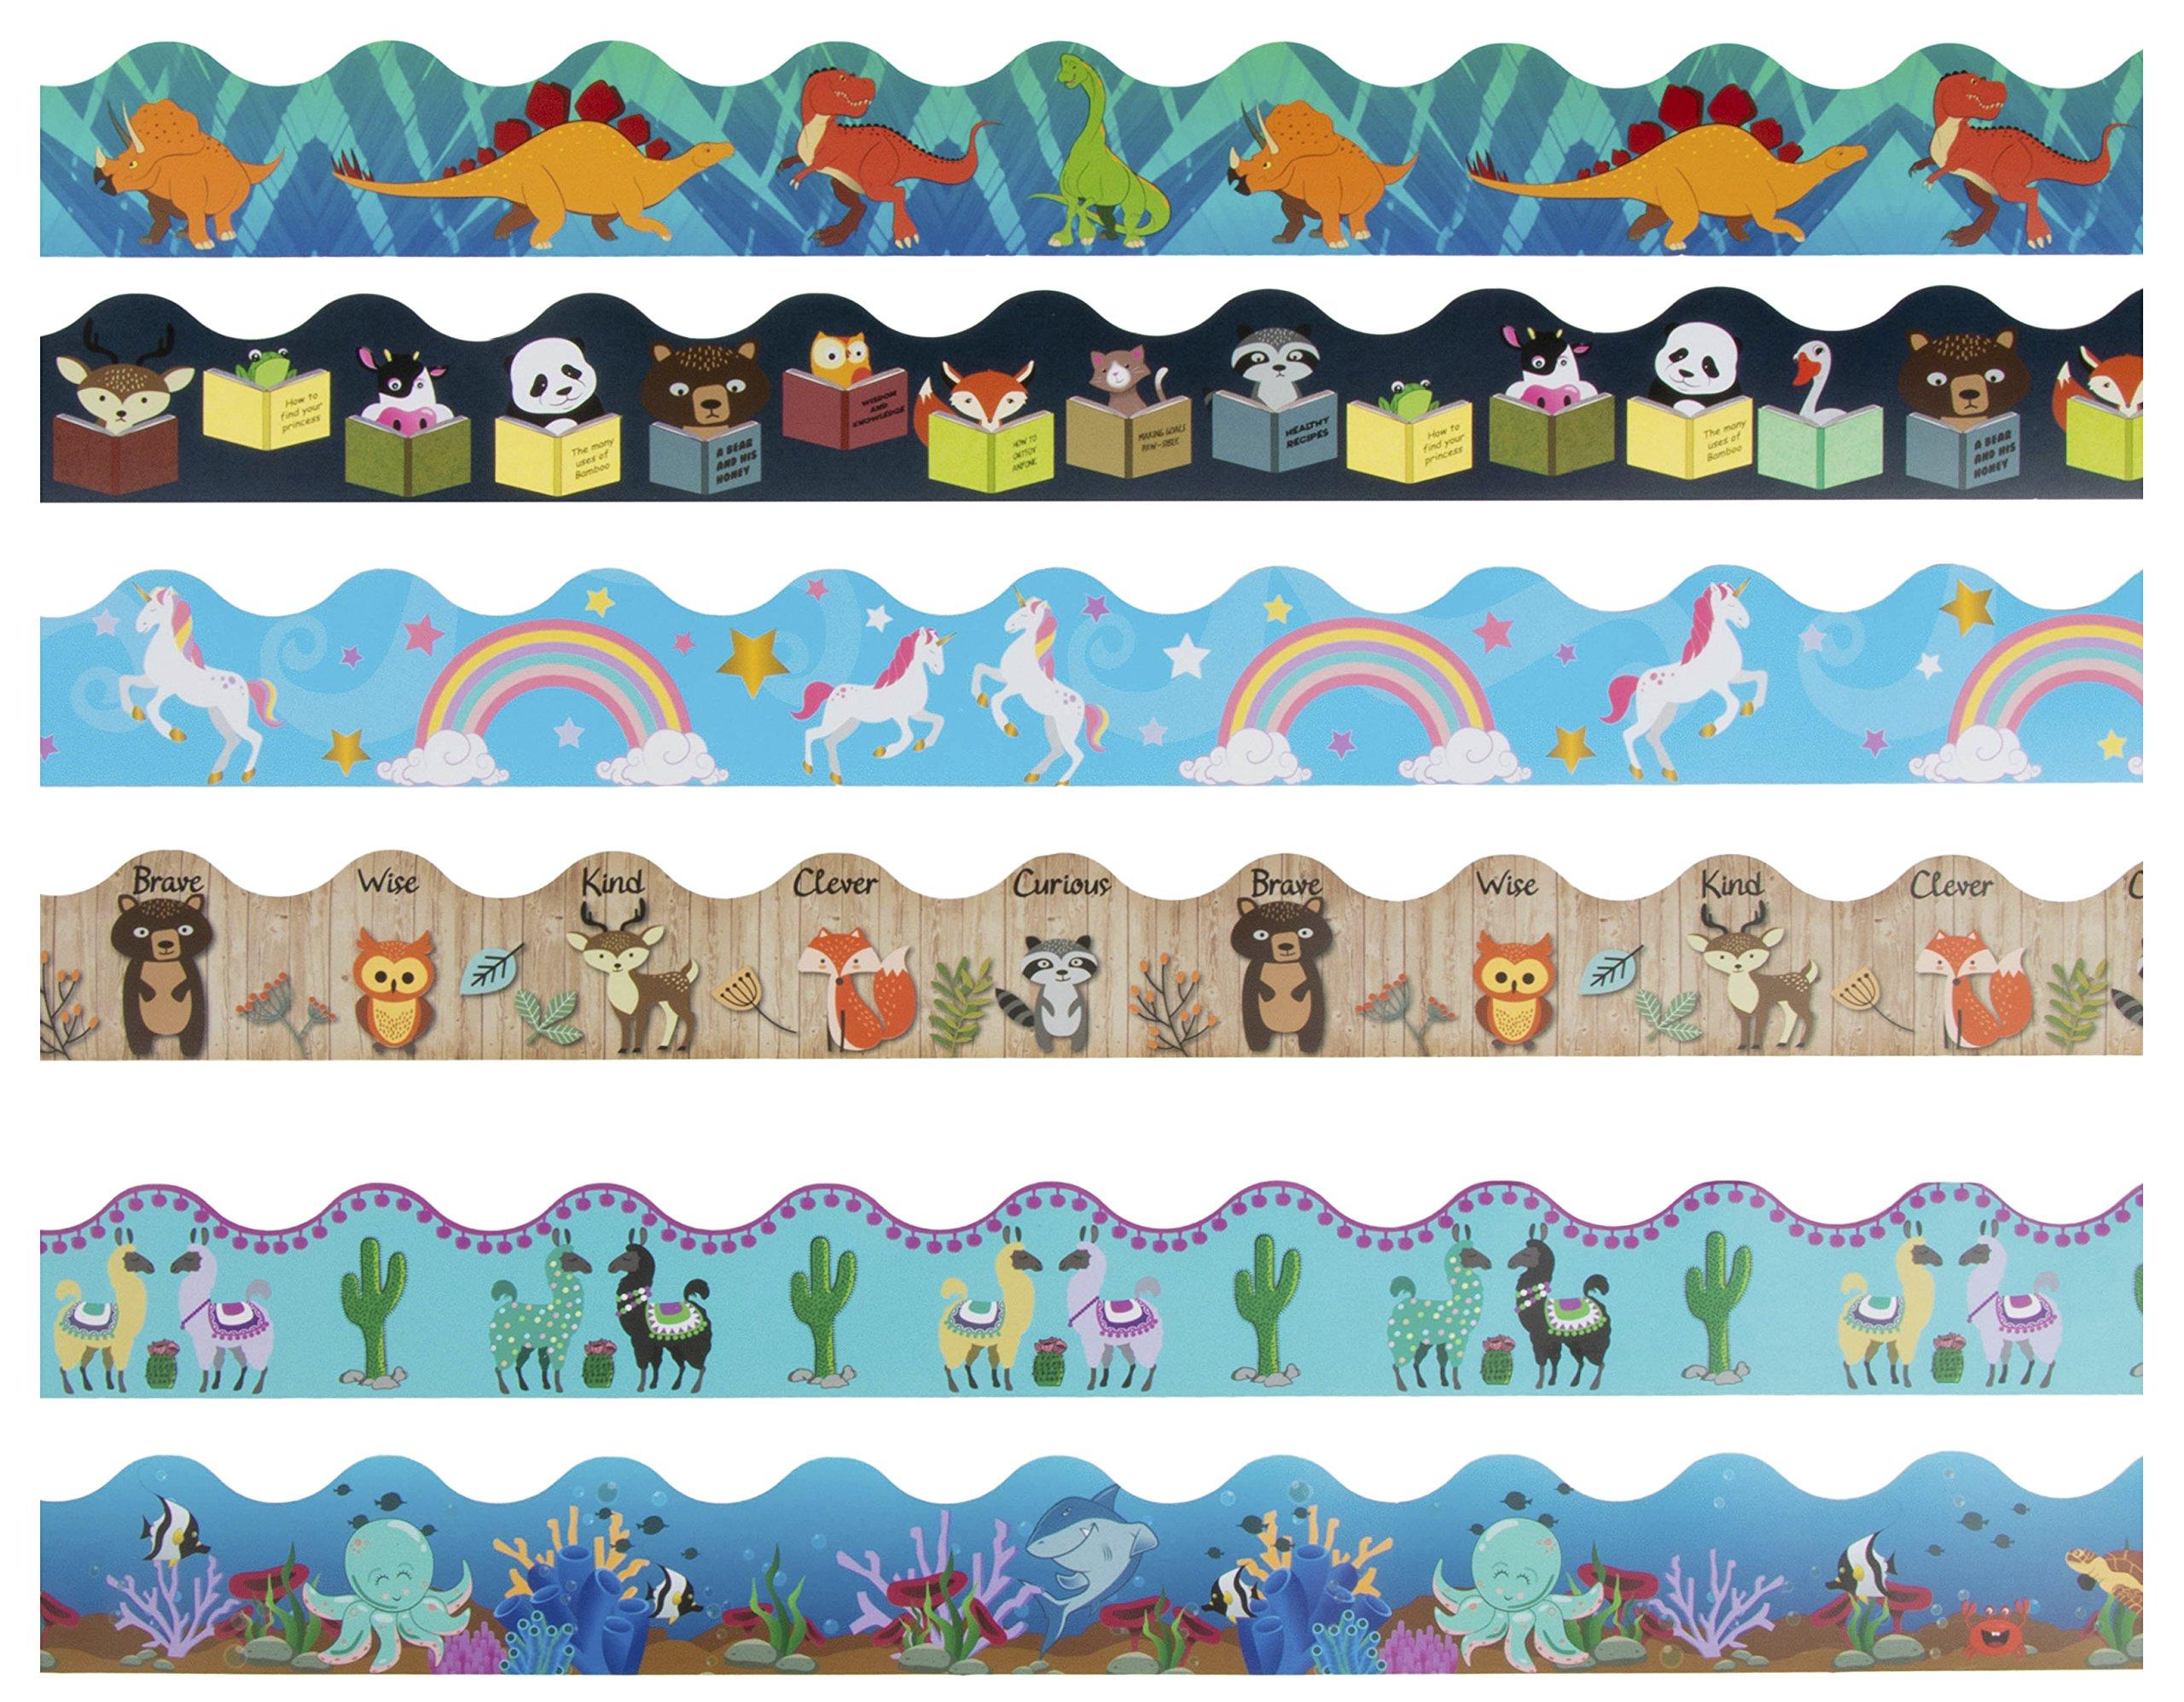 Bulletin Borders - 6-Pack Bulletin Board Borders, Cute Animals Theme Decorative Trimmers, Border Trim for Classroom, School, 2.25 x 36 inches